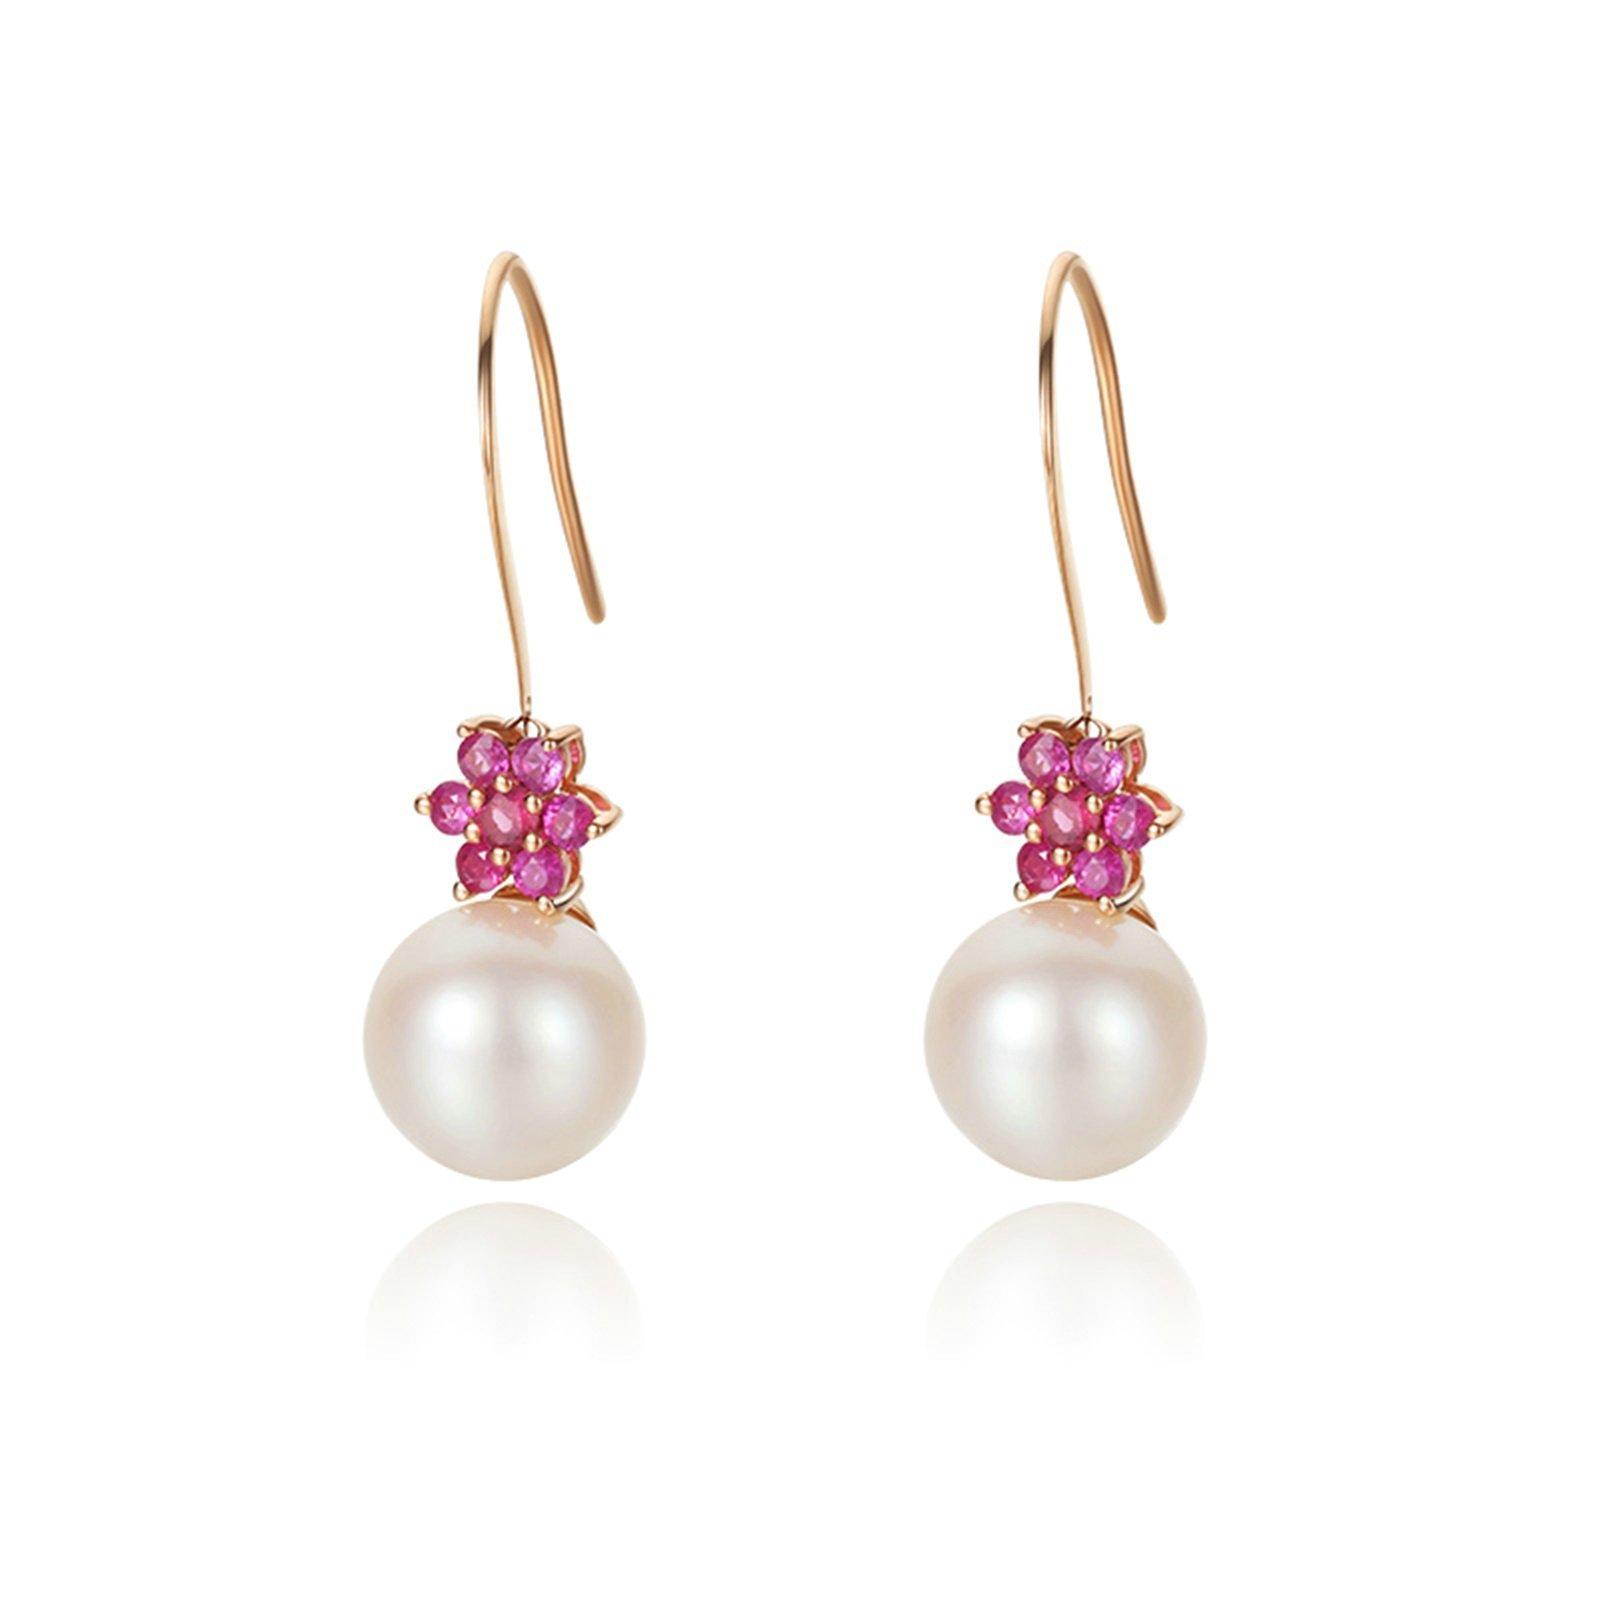 Daesar Rose Gold Earrings 18K Stud Earrings for Women Flower Pearls Dangle Earrings Wedding